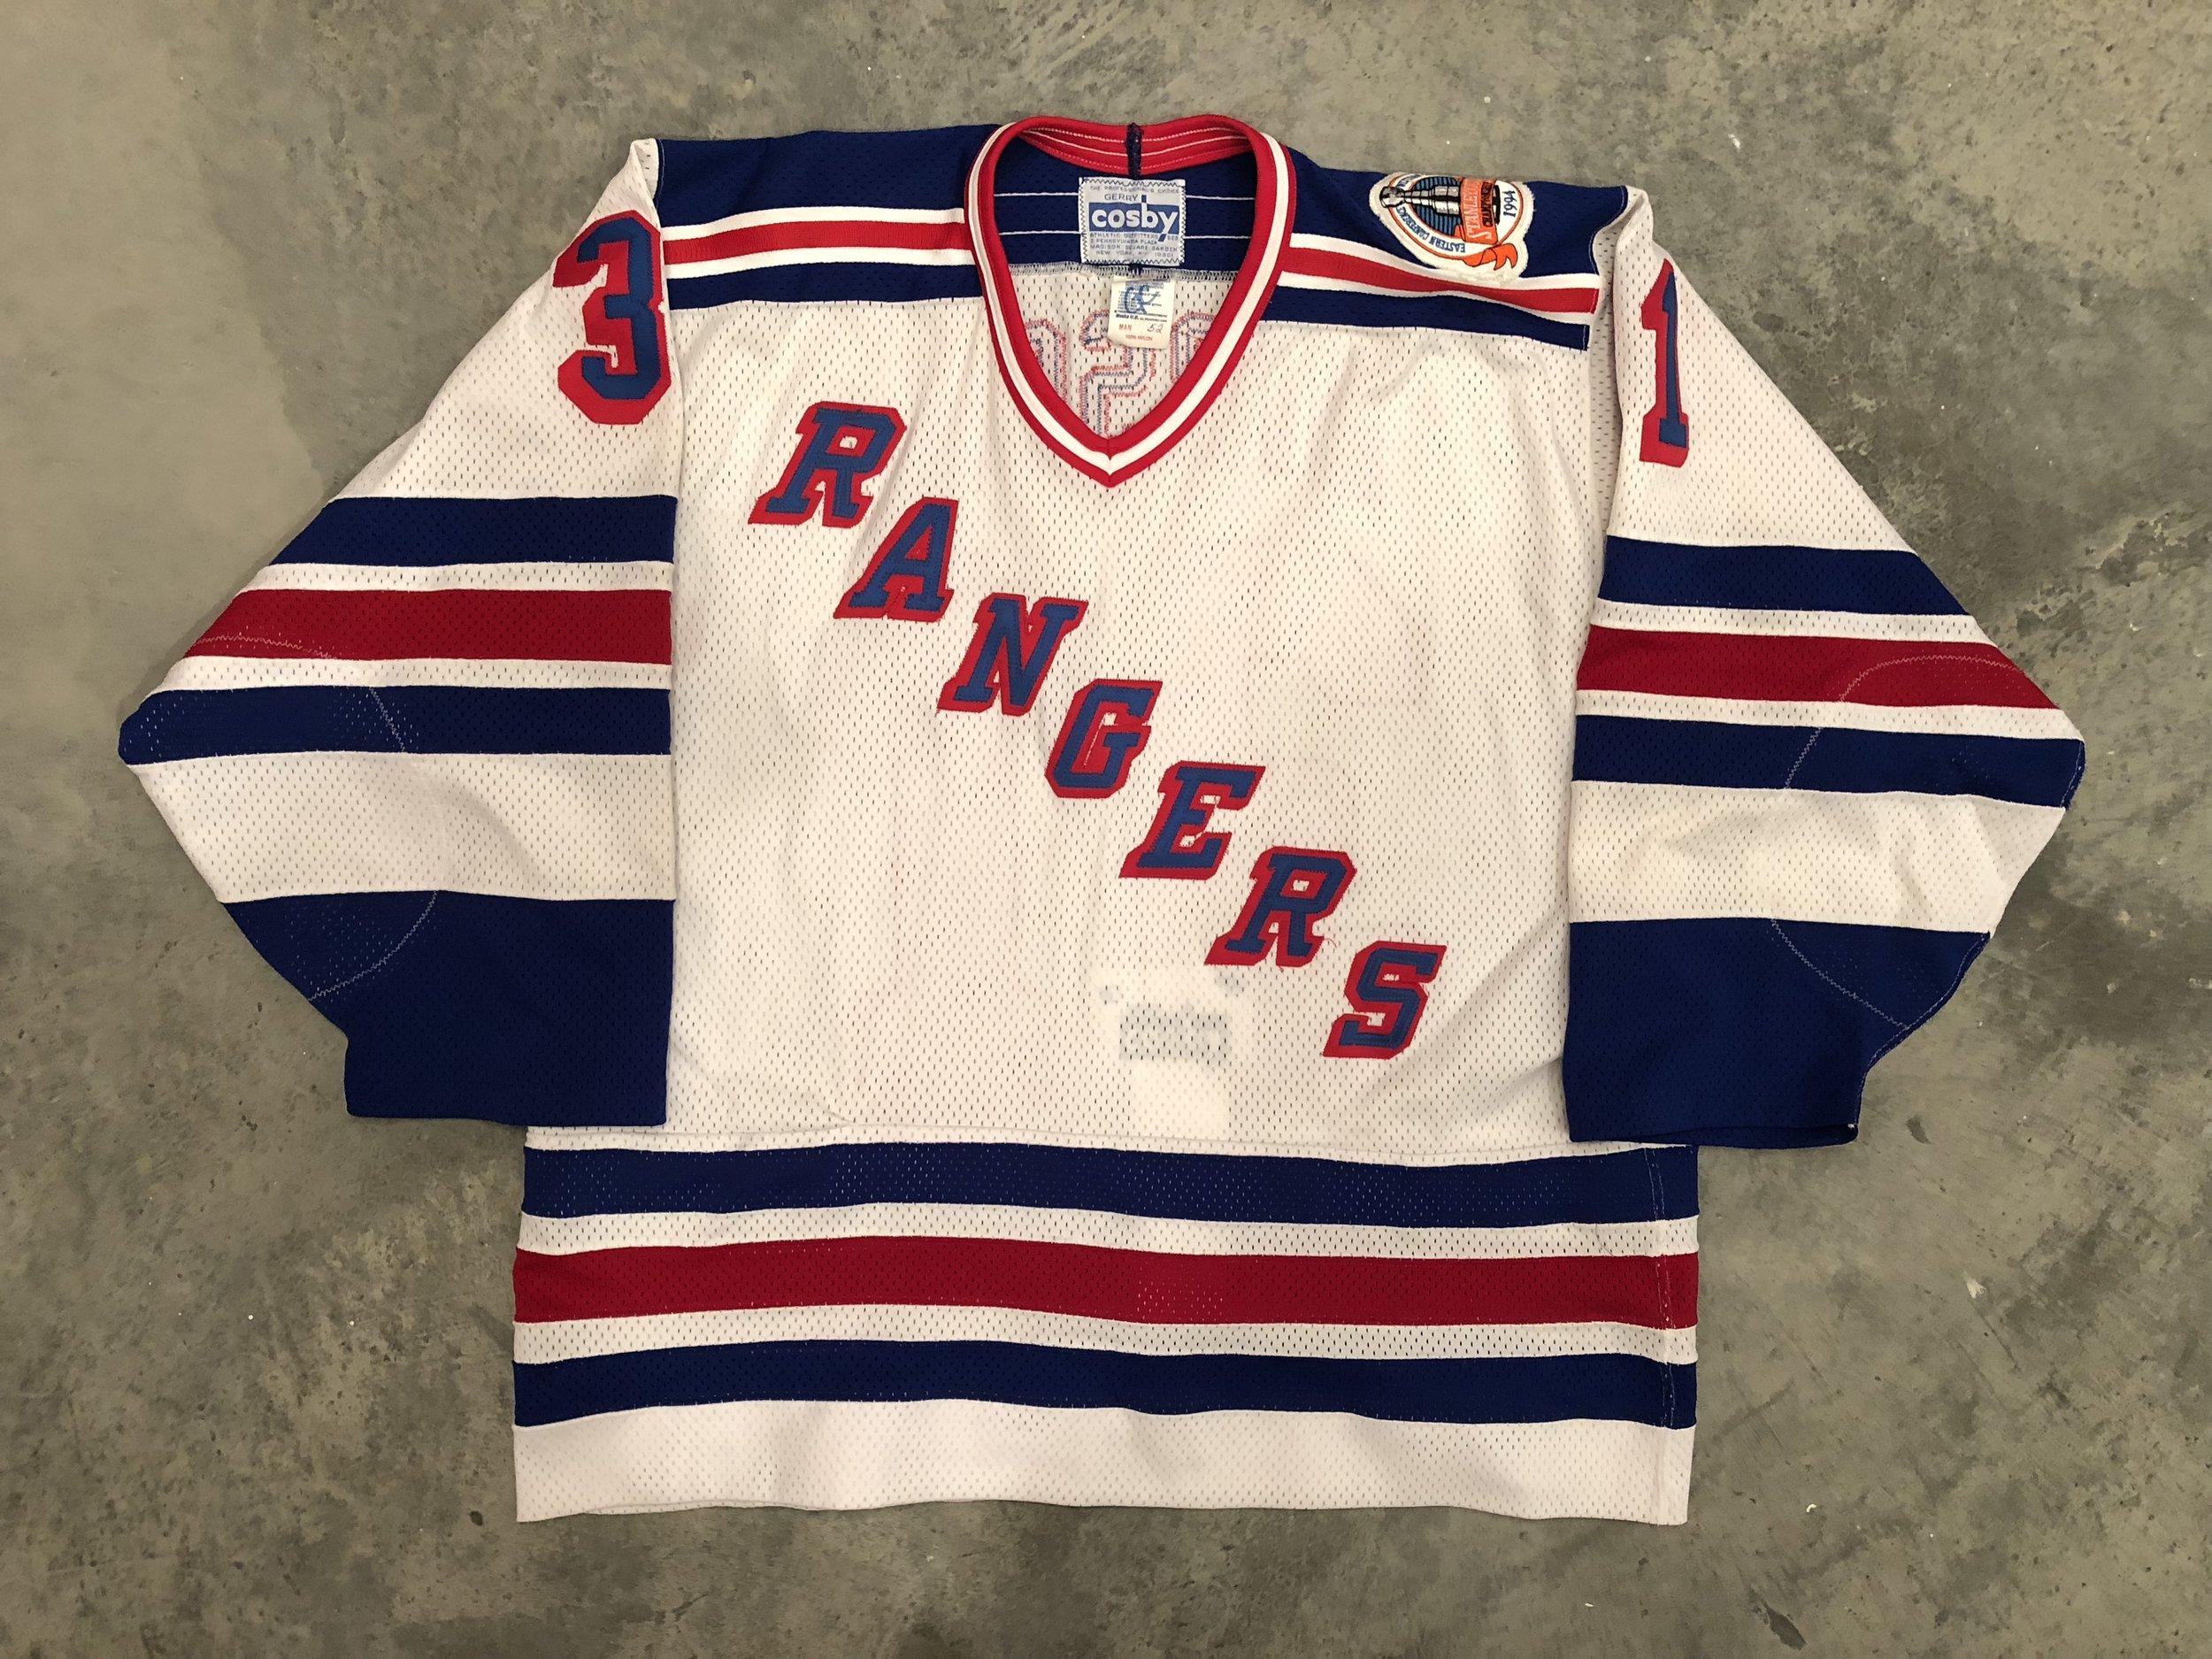 1994 New York Ranger Stanley Cup Finals Game Issued Home Jersey - Corey Hirsch